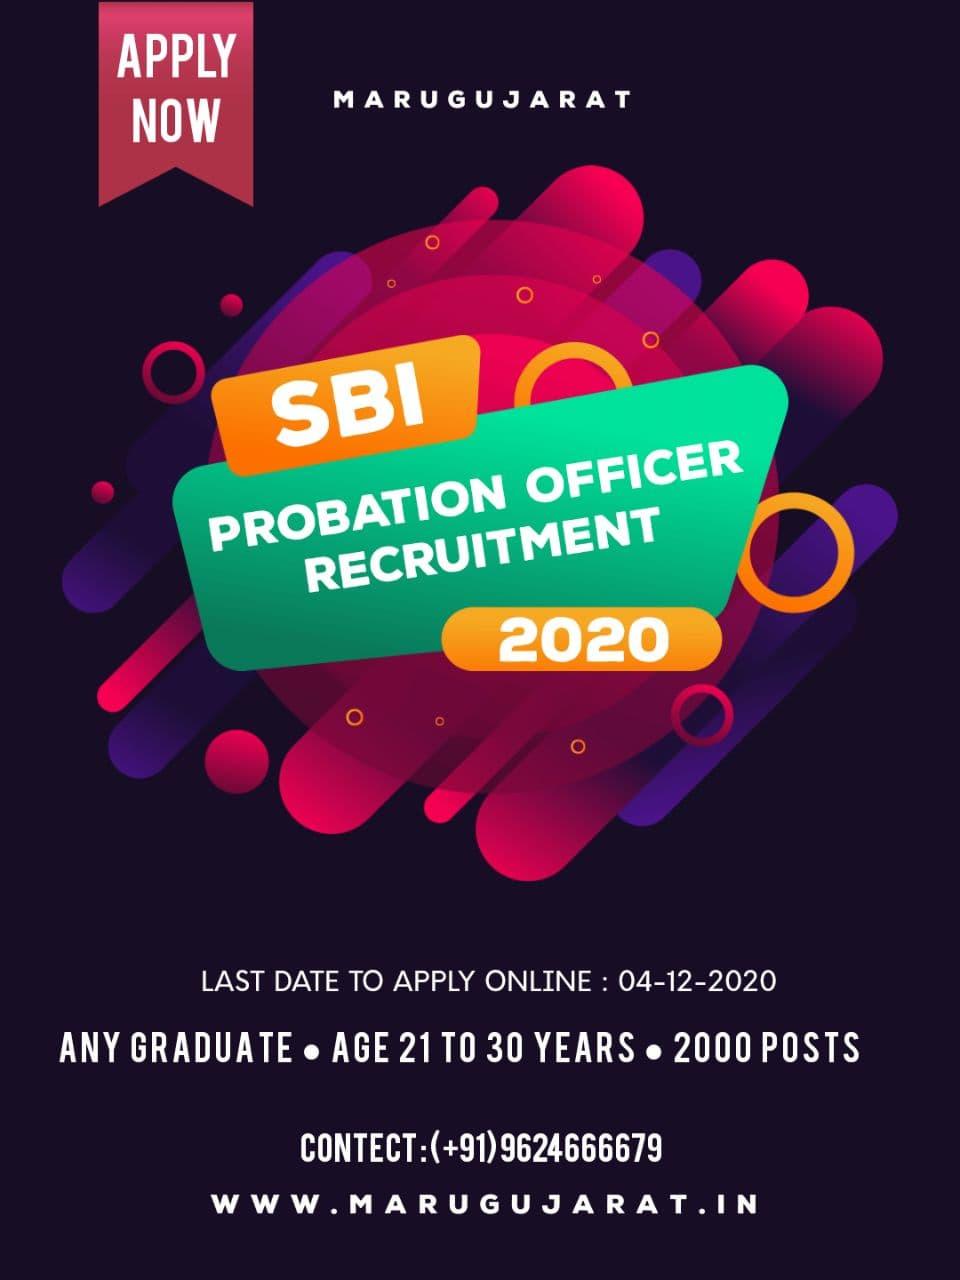 https://updates.marugujarat.in/2020/11/sbi-recruitment-for-2000-probationary.html